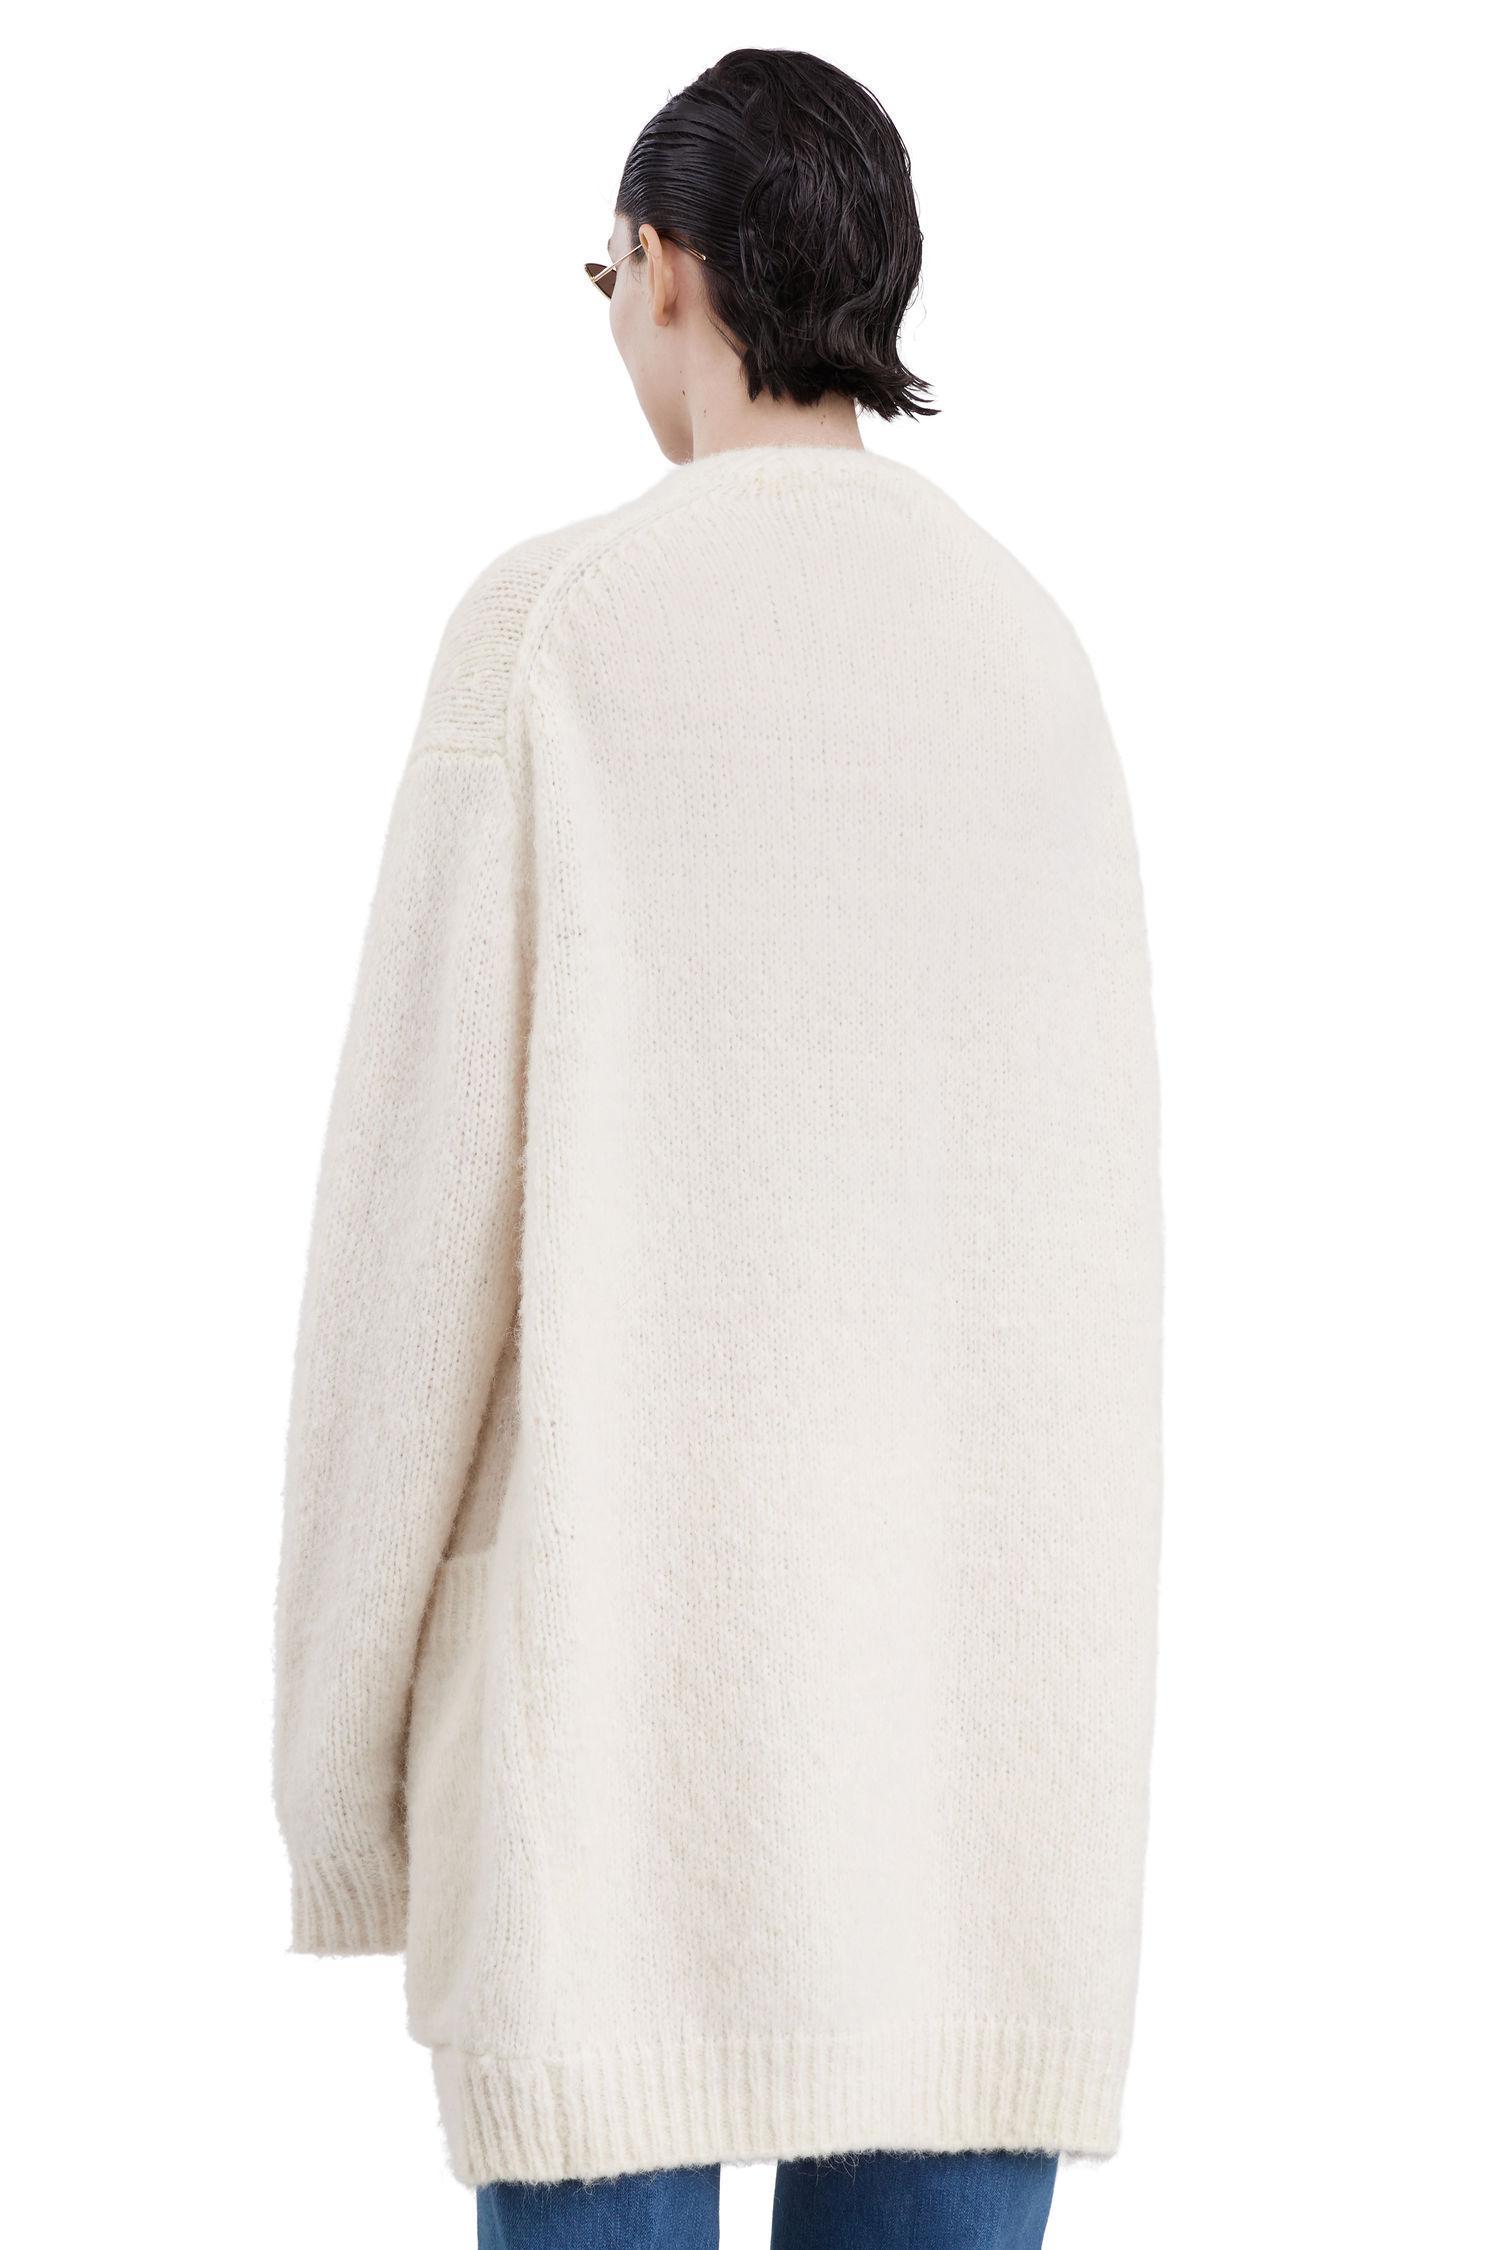 Acne studios Astrid Alpaca pearl White